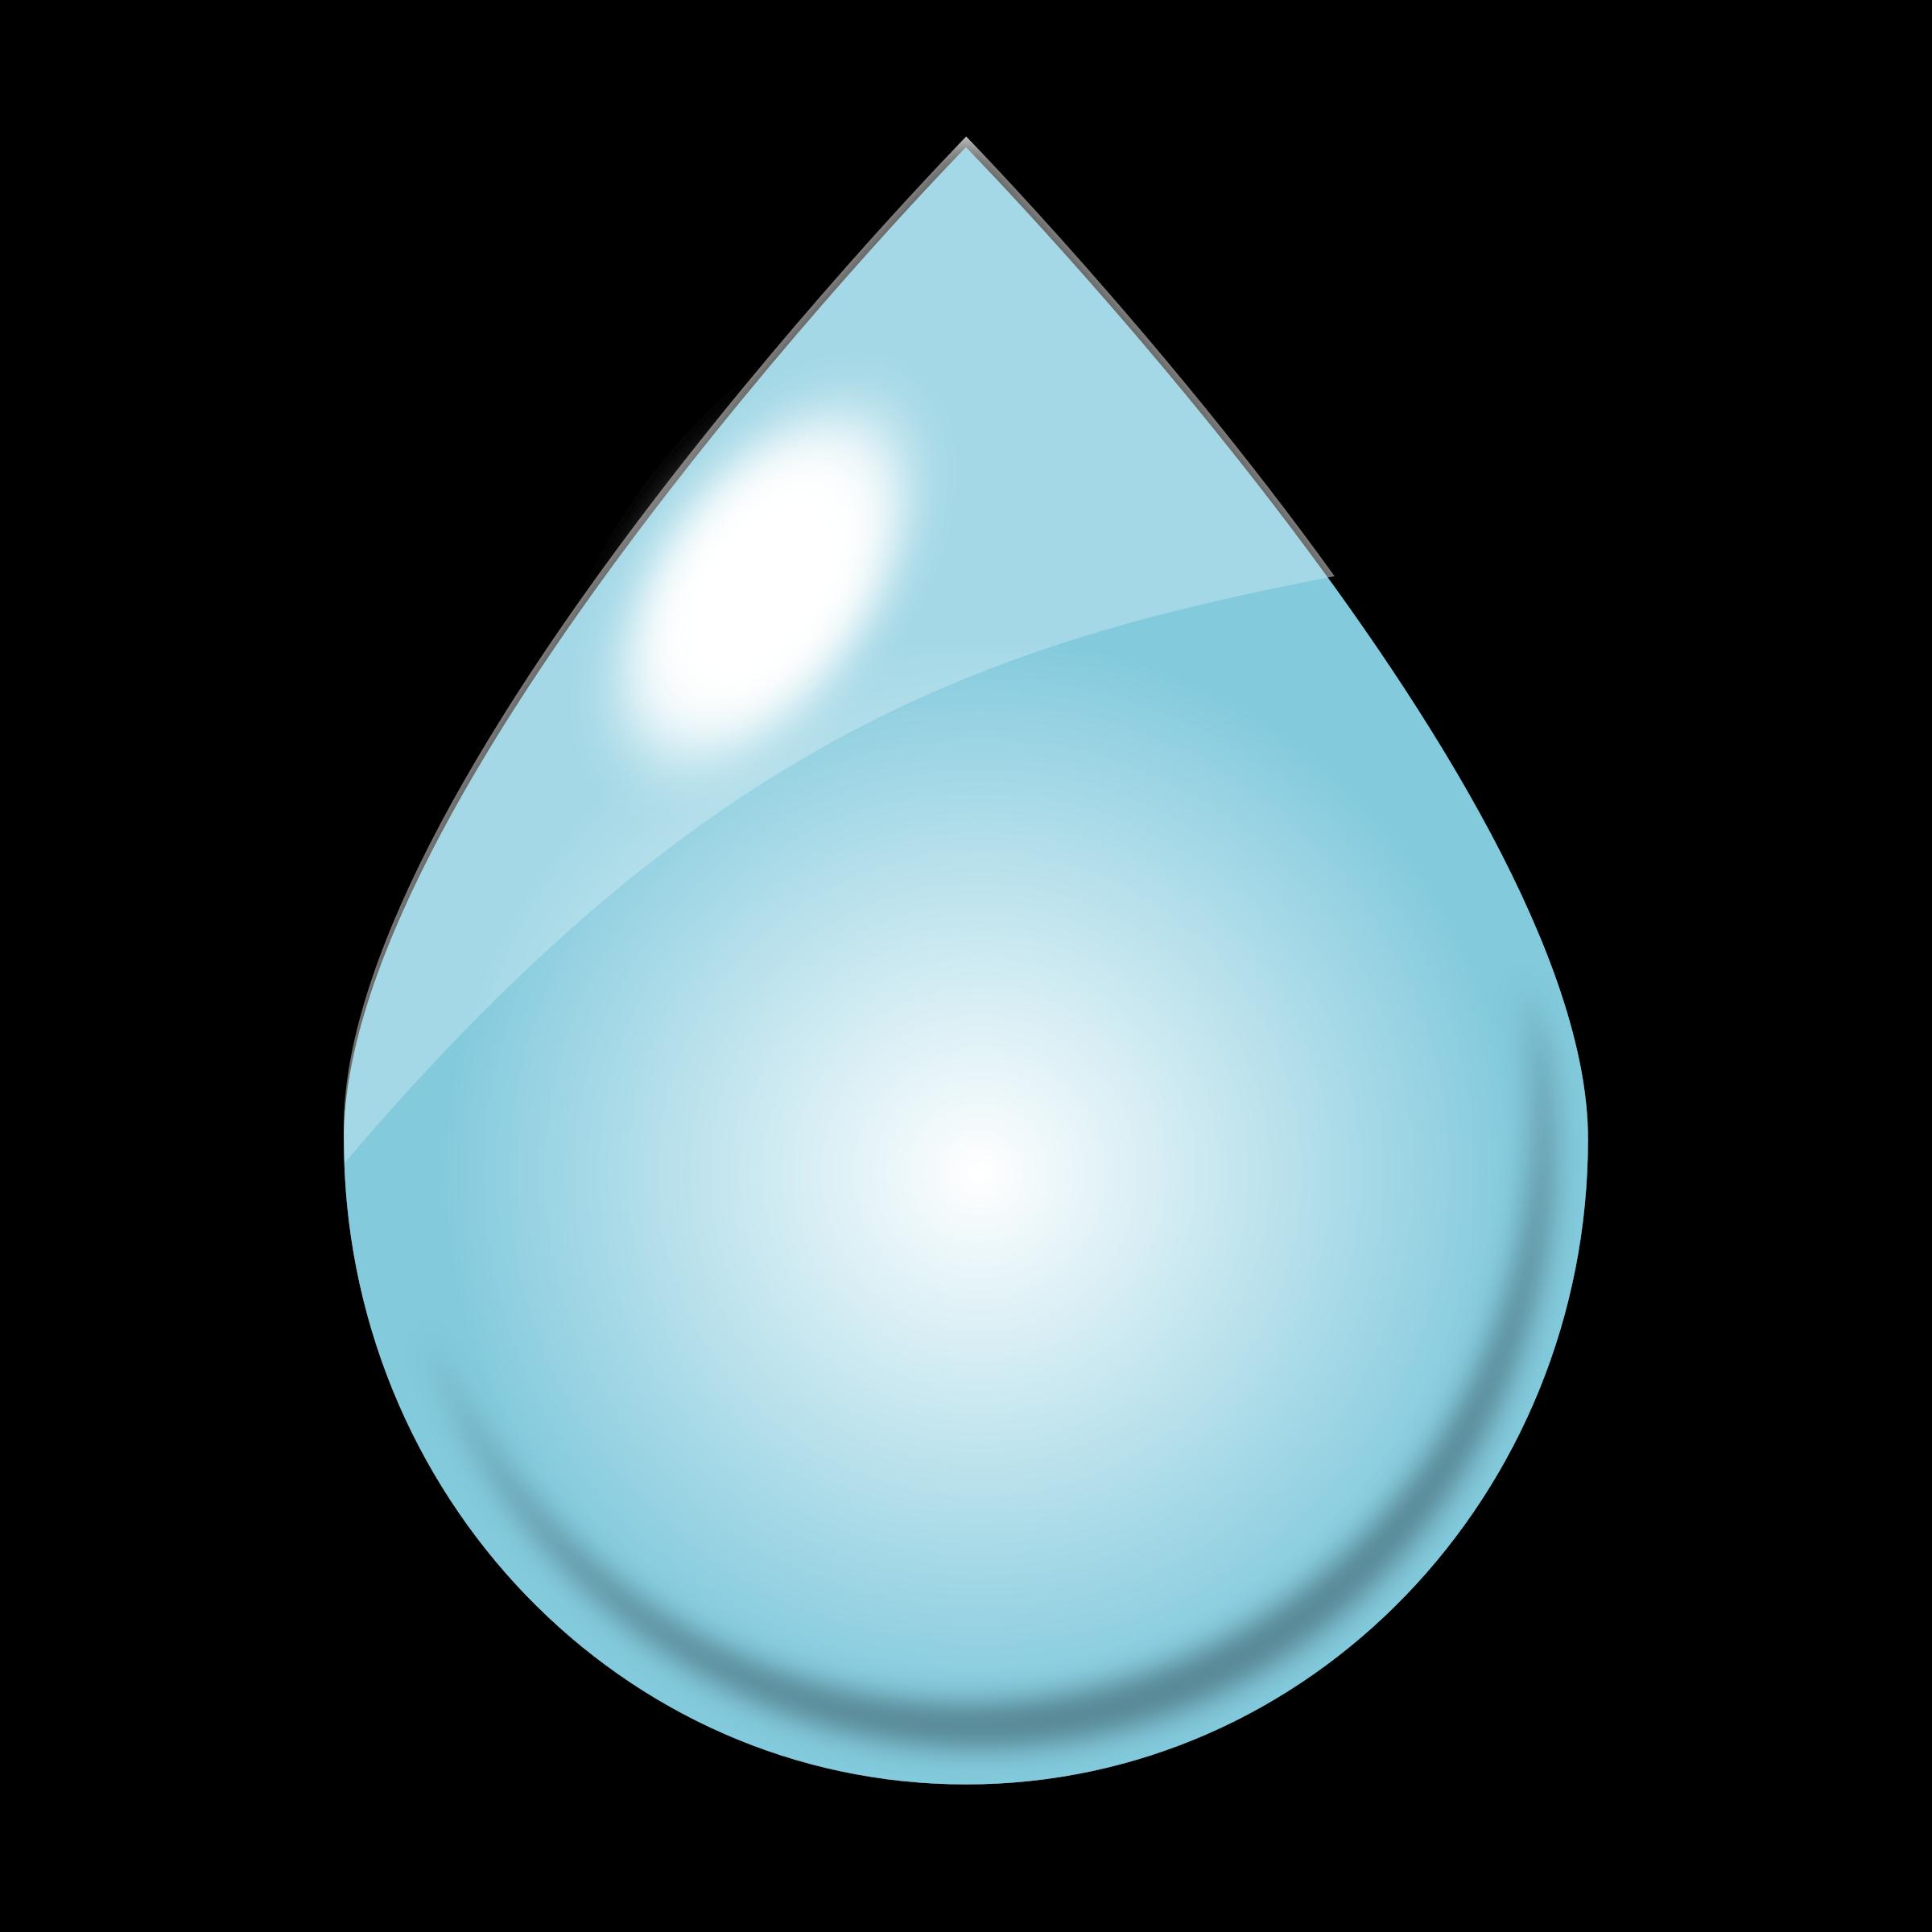 2400x2400 Photos Of Raindrop Clip Art Rain Drops Water Drop Image